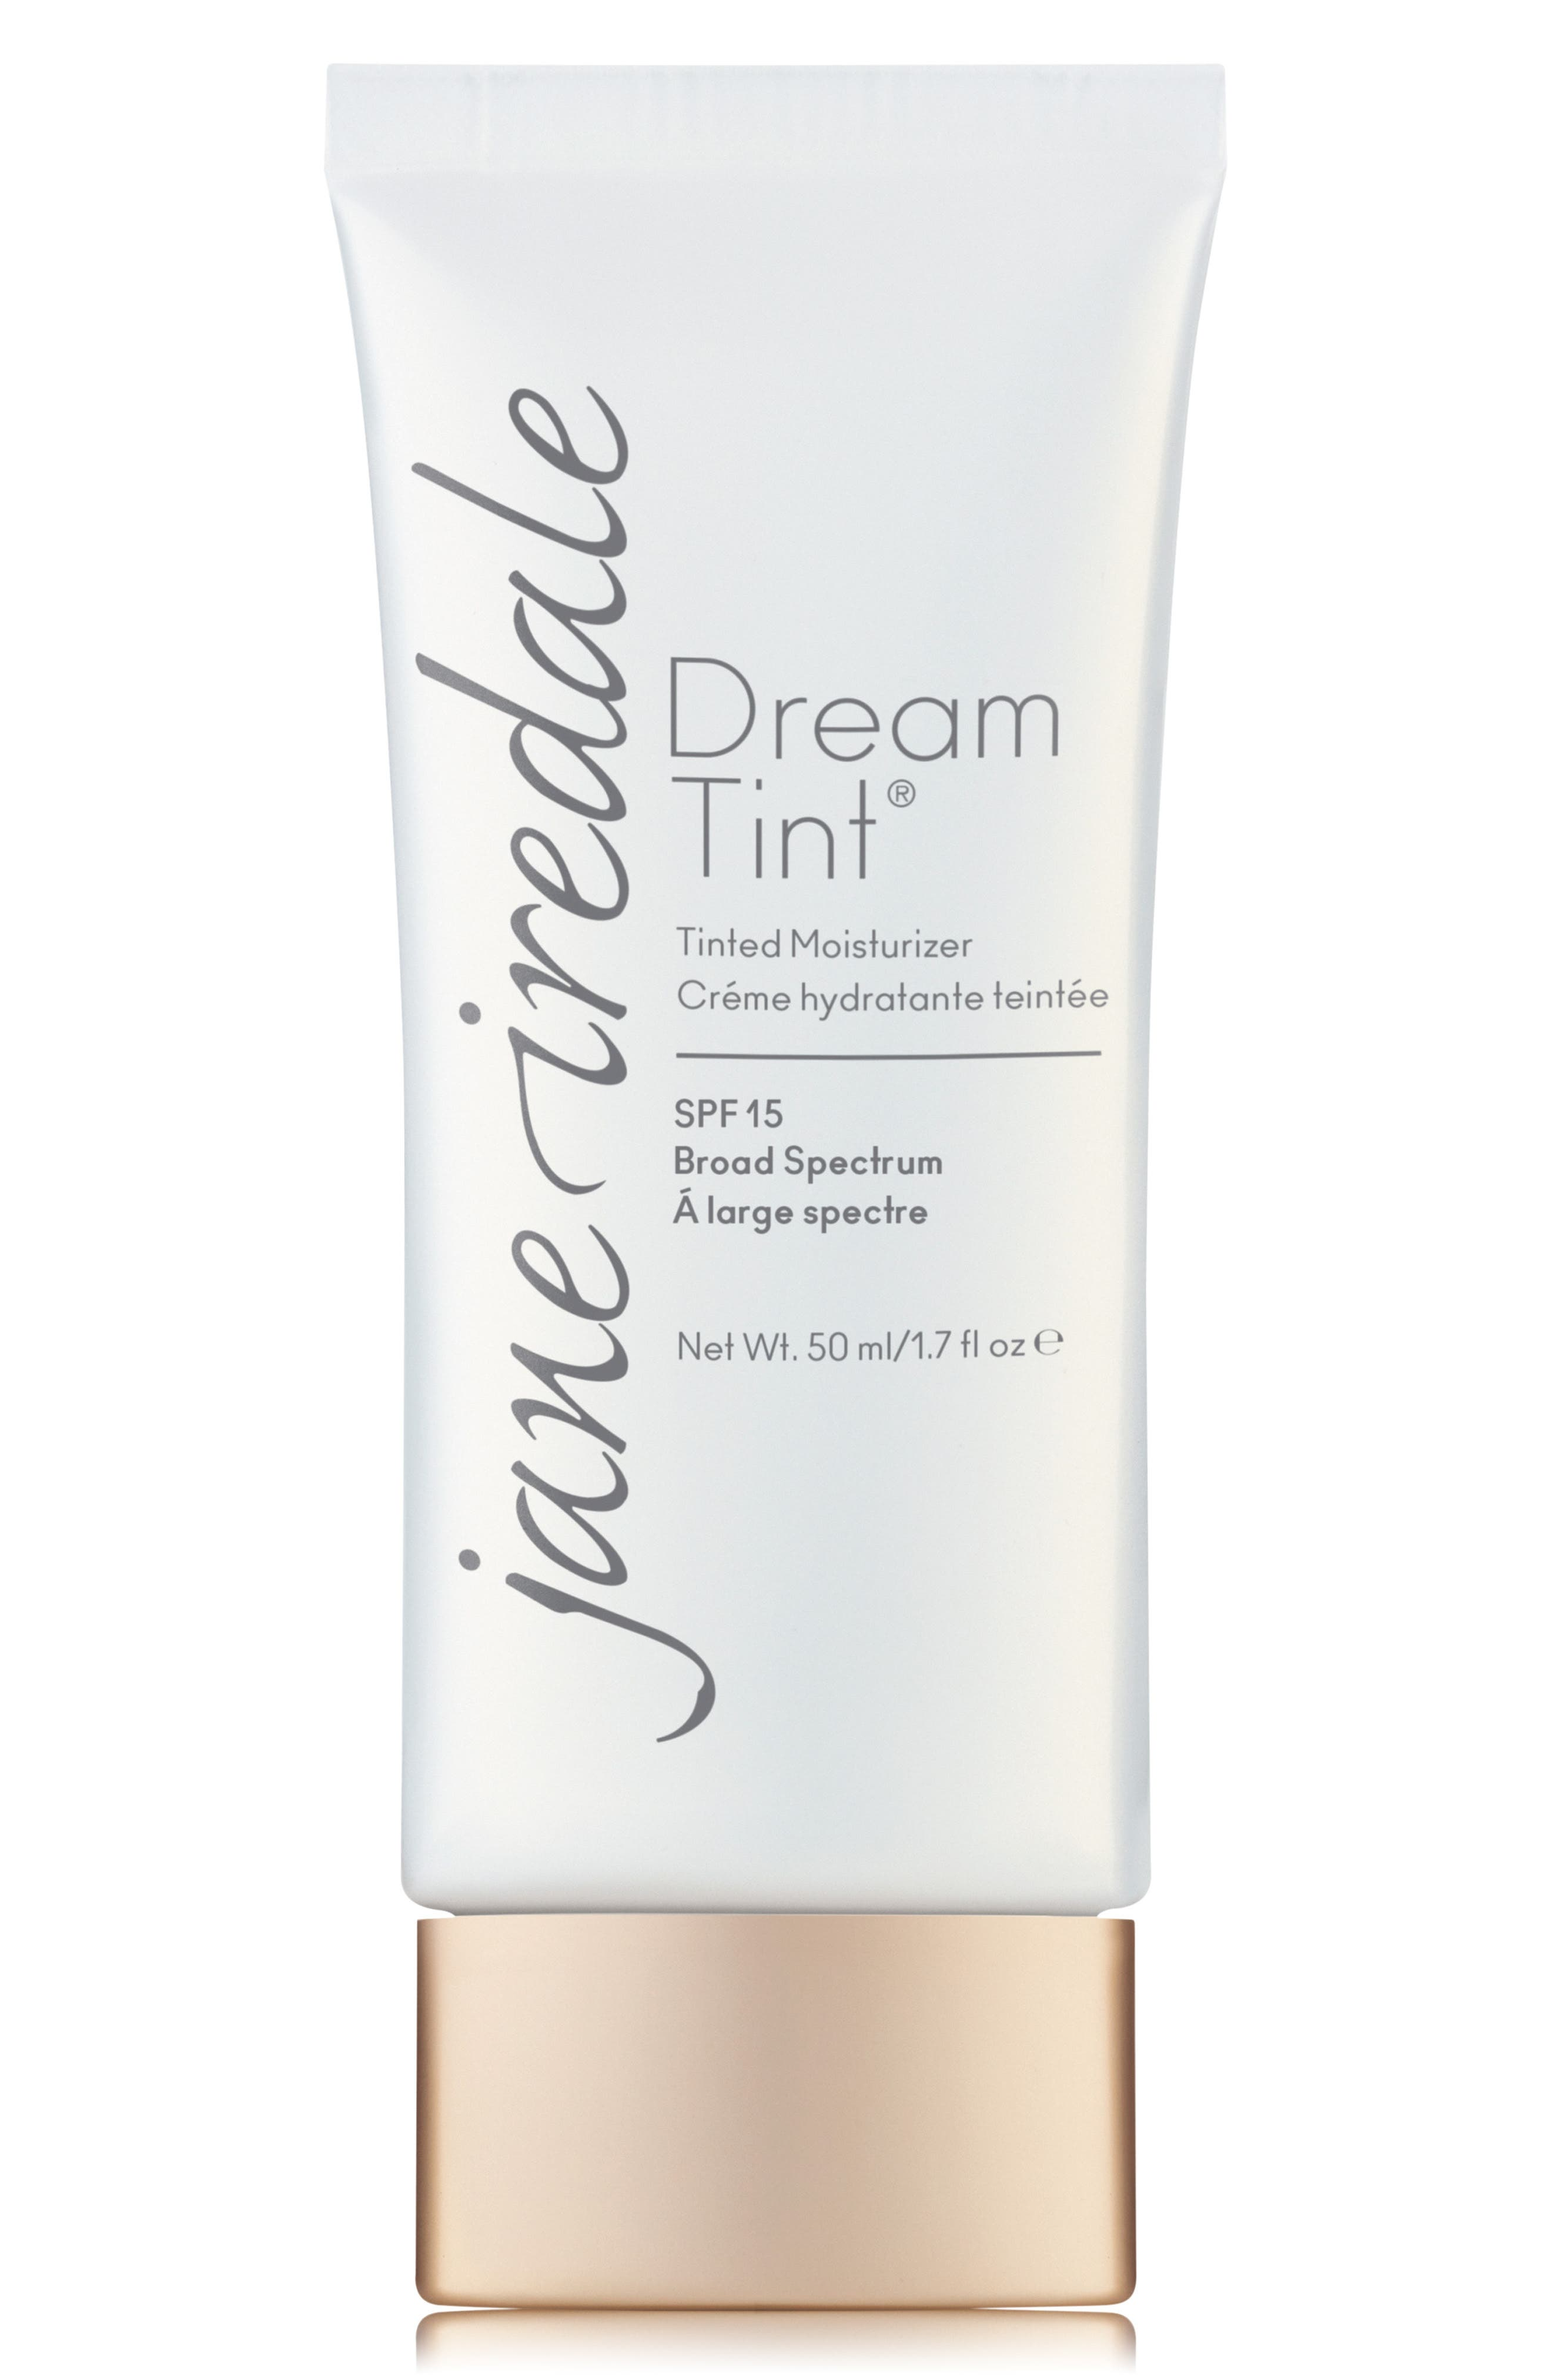 Dream Tint Moisture Tint Broad Spectrum Spf 15